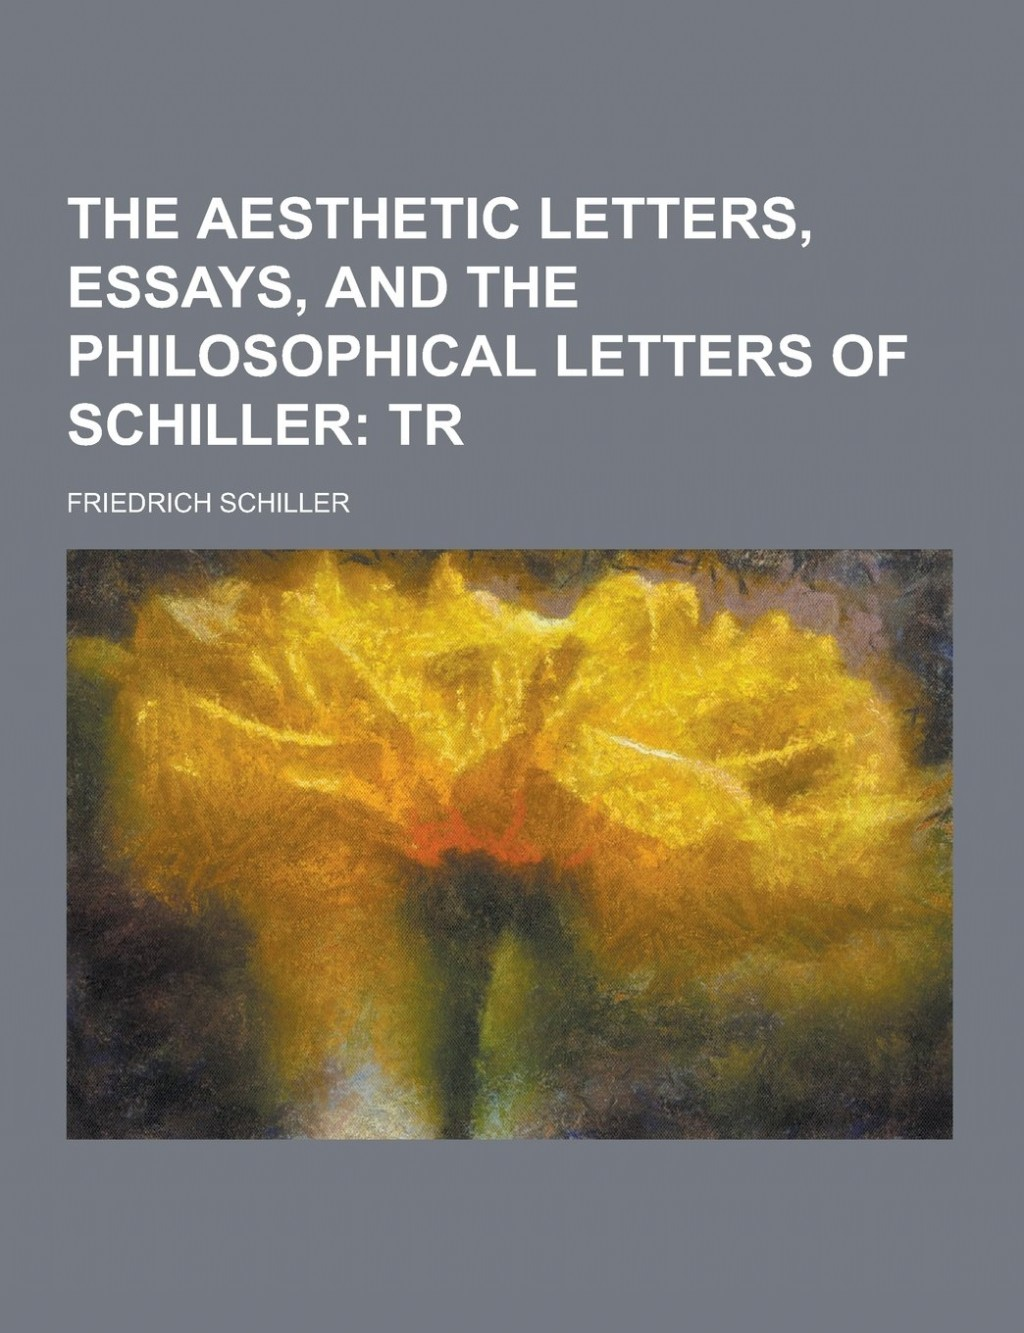 012 Essay Example Schiller Essays Awful Friedrich Large